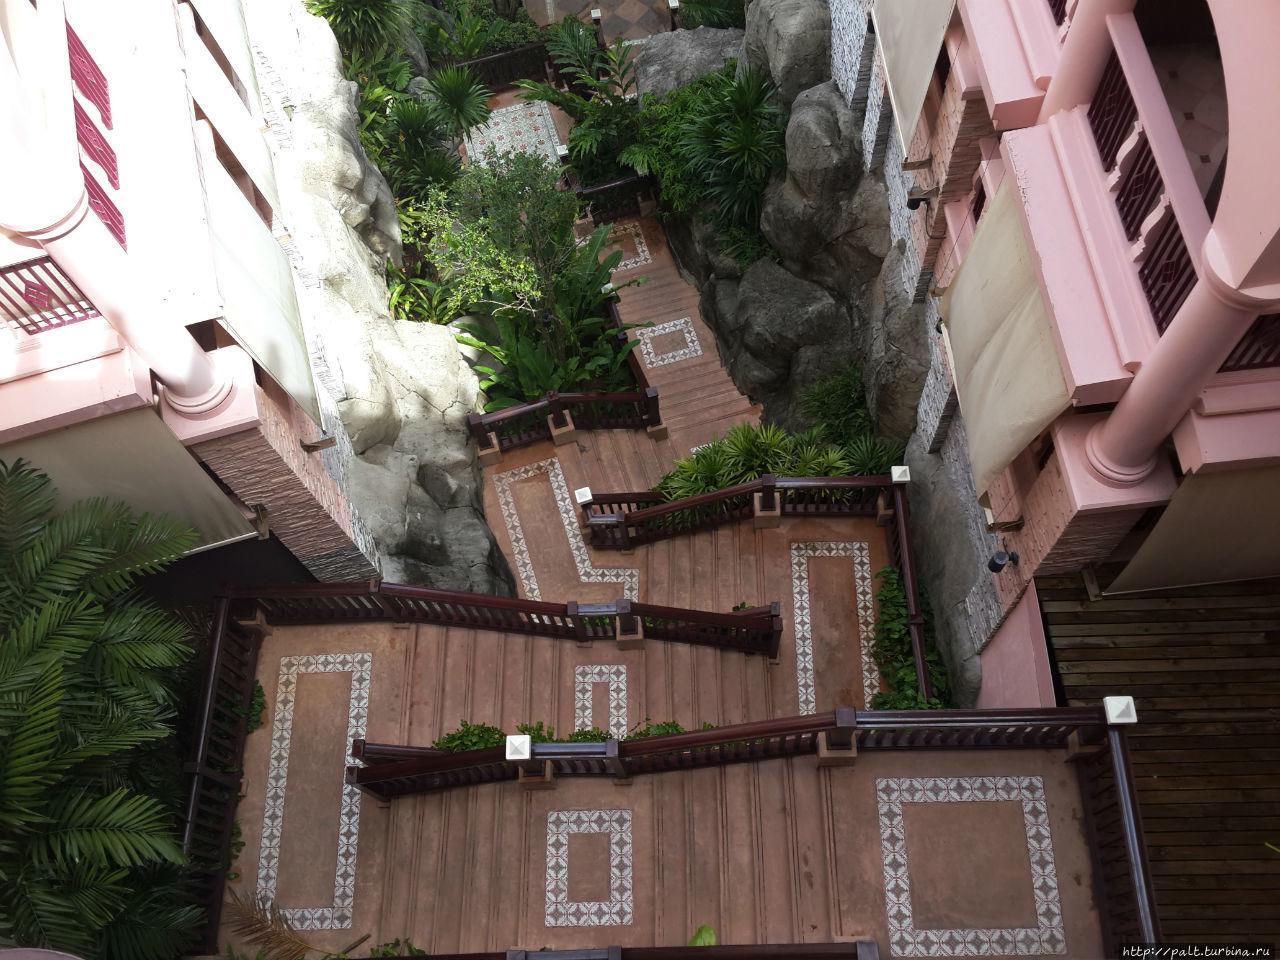 Лестница между корпусами 2 и 3